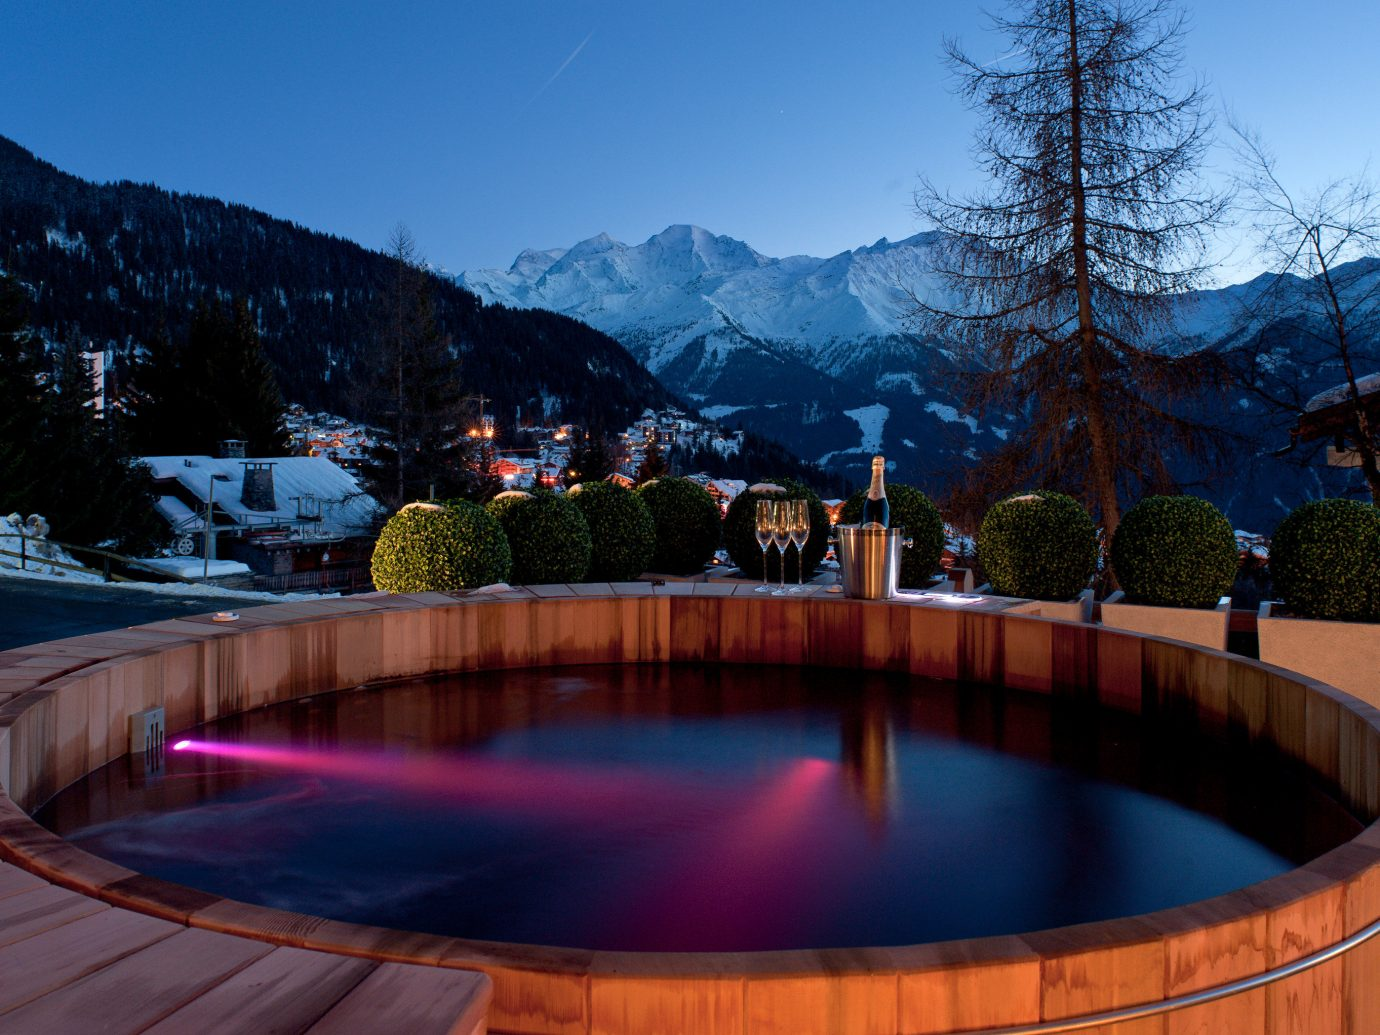 Hotels Luxury Travel Mountains + Skiing sky tree outdoor mountain swimming pool leisure Resort estate backyard